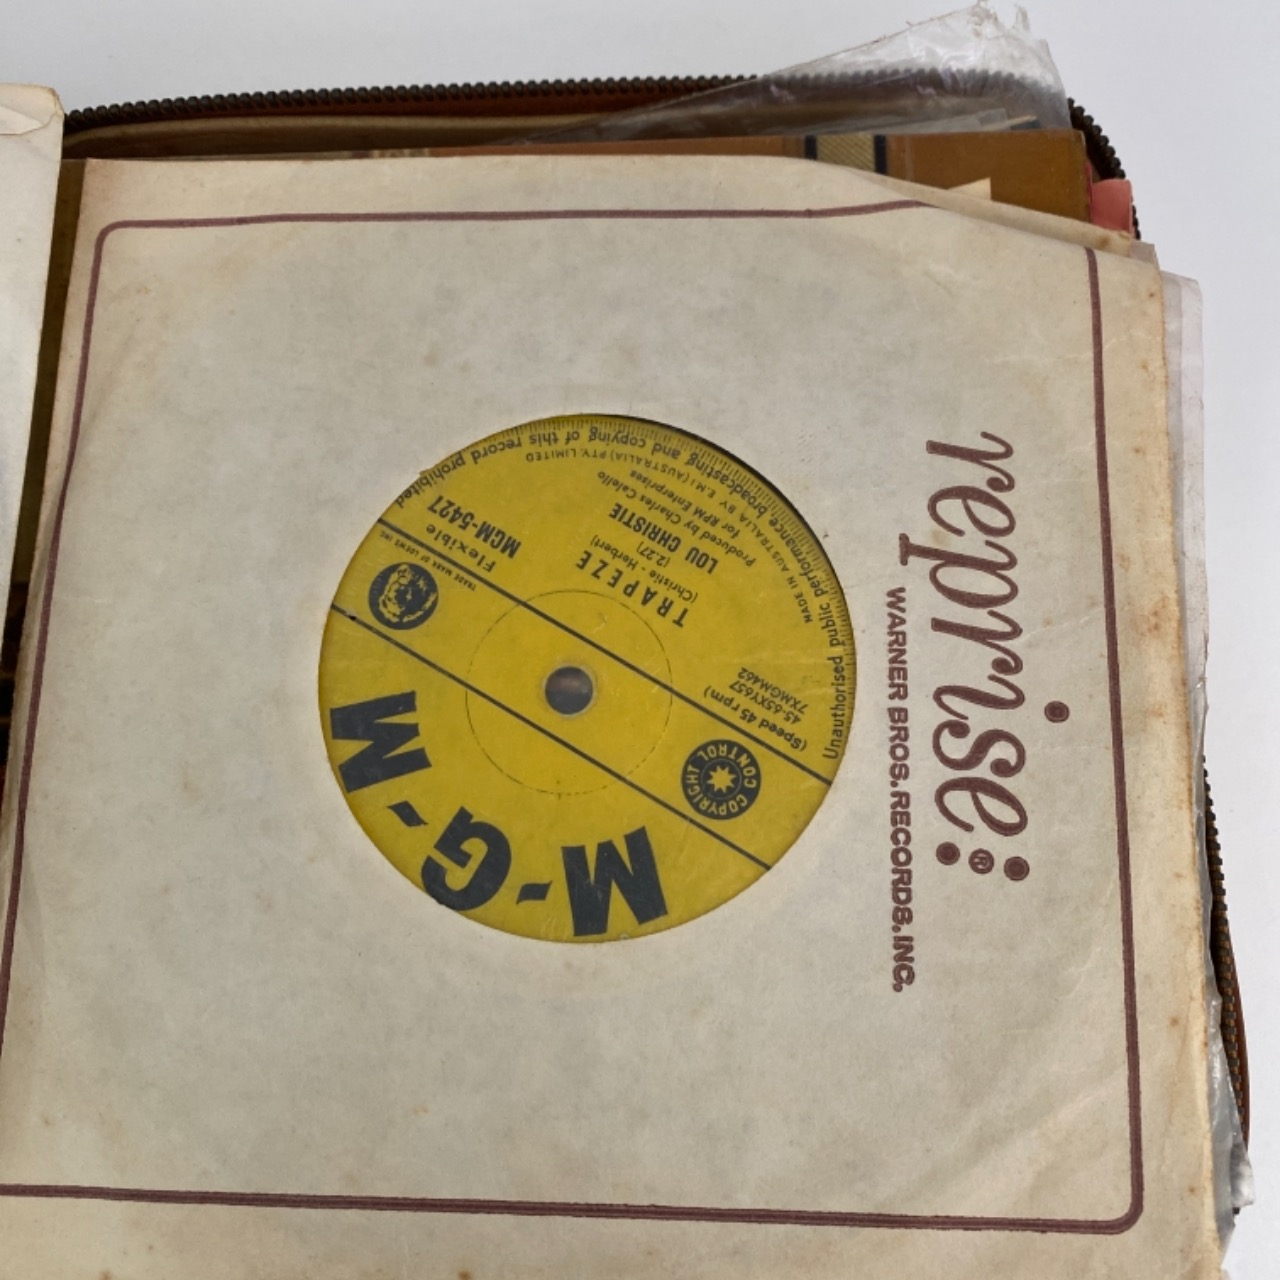 Bravo records LP classic collection